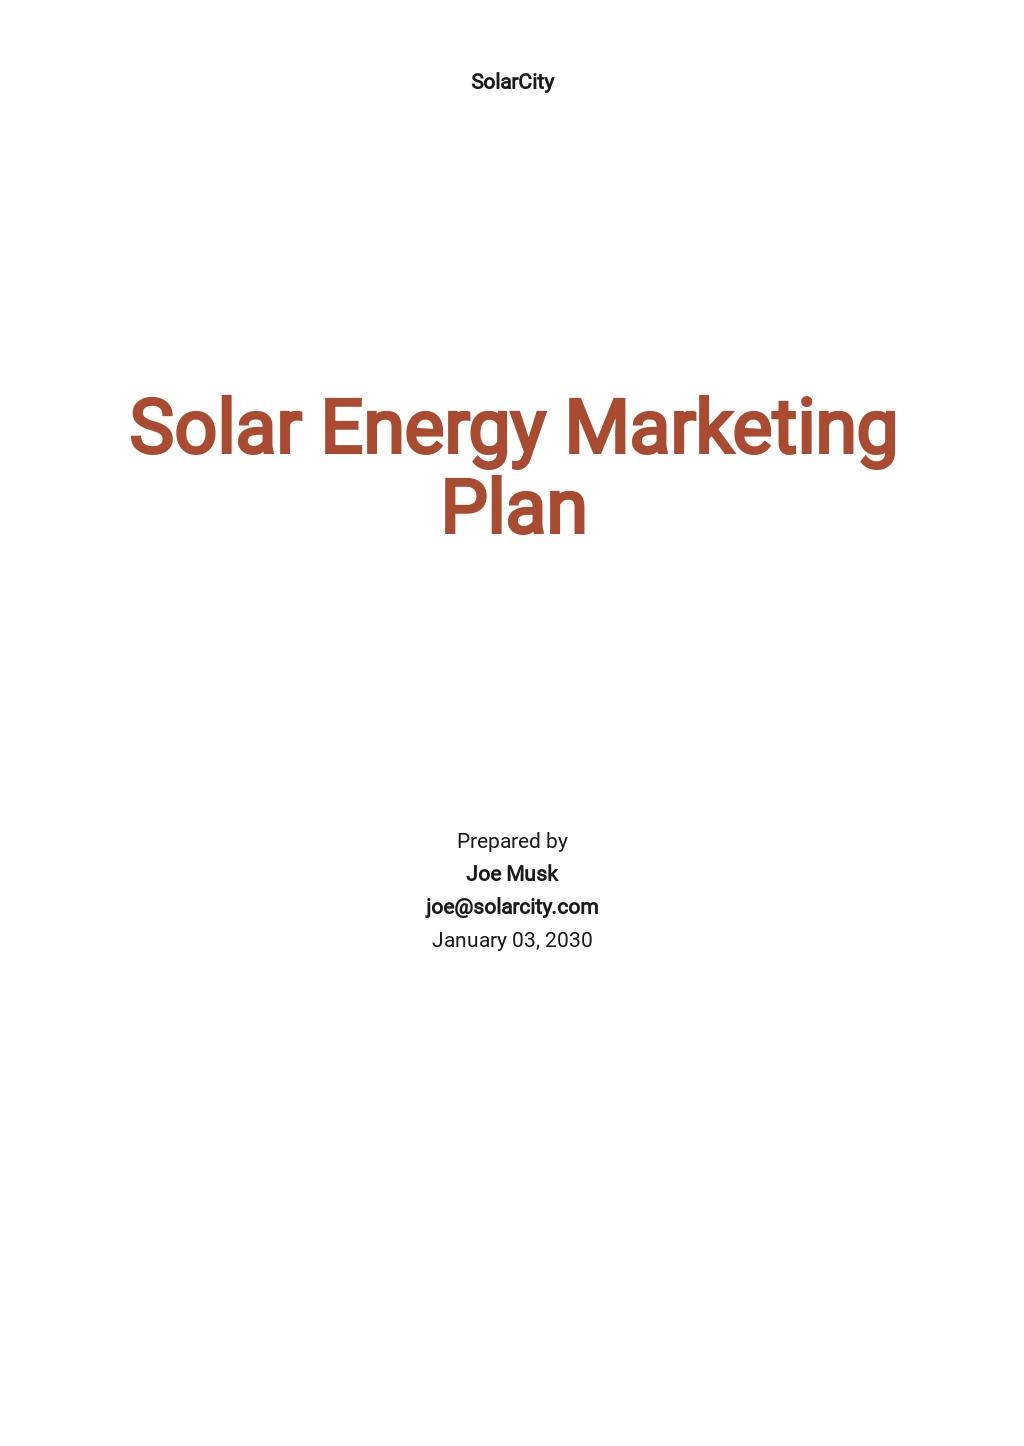 Solar Energy Marketing Plan Template